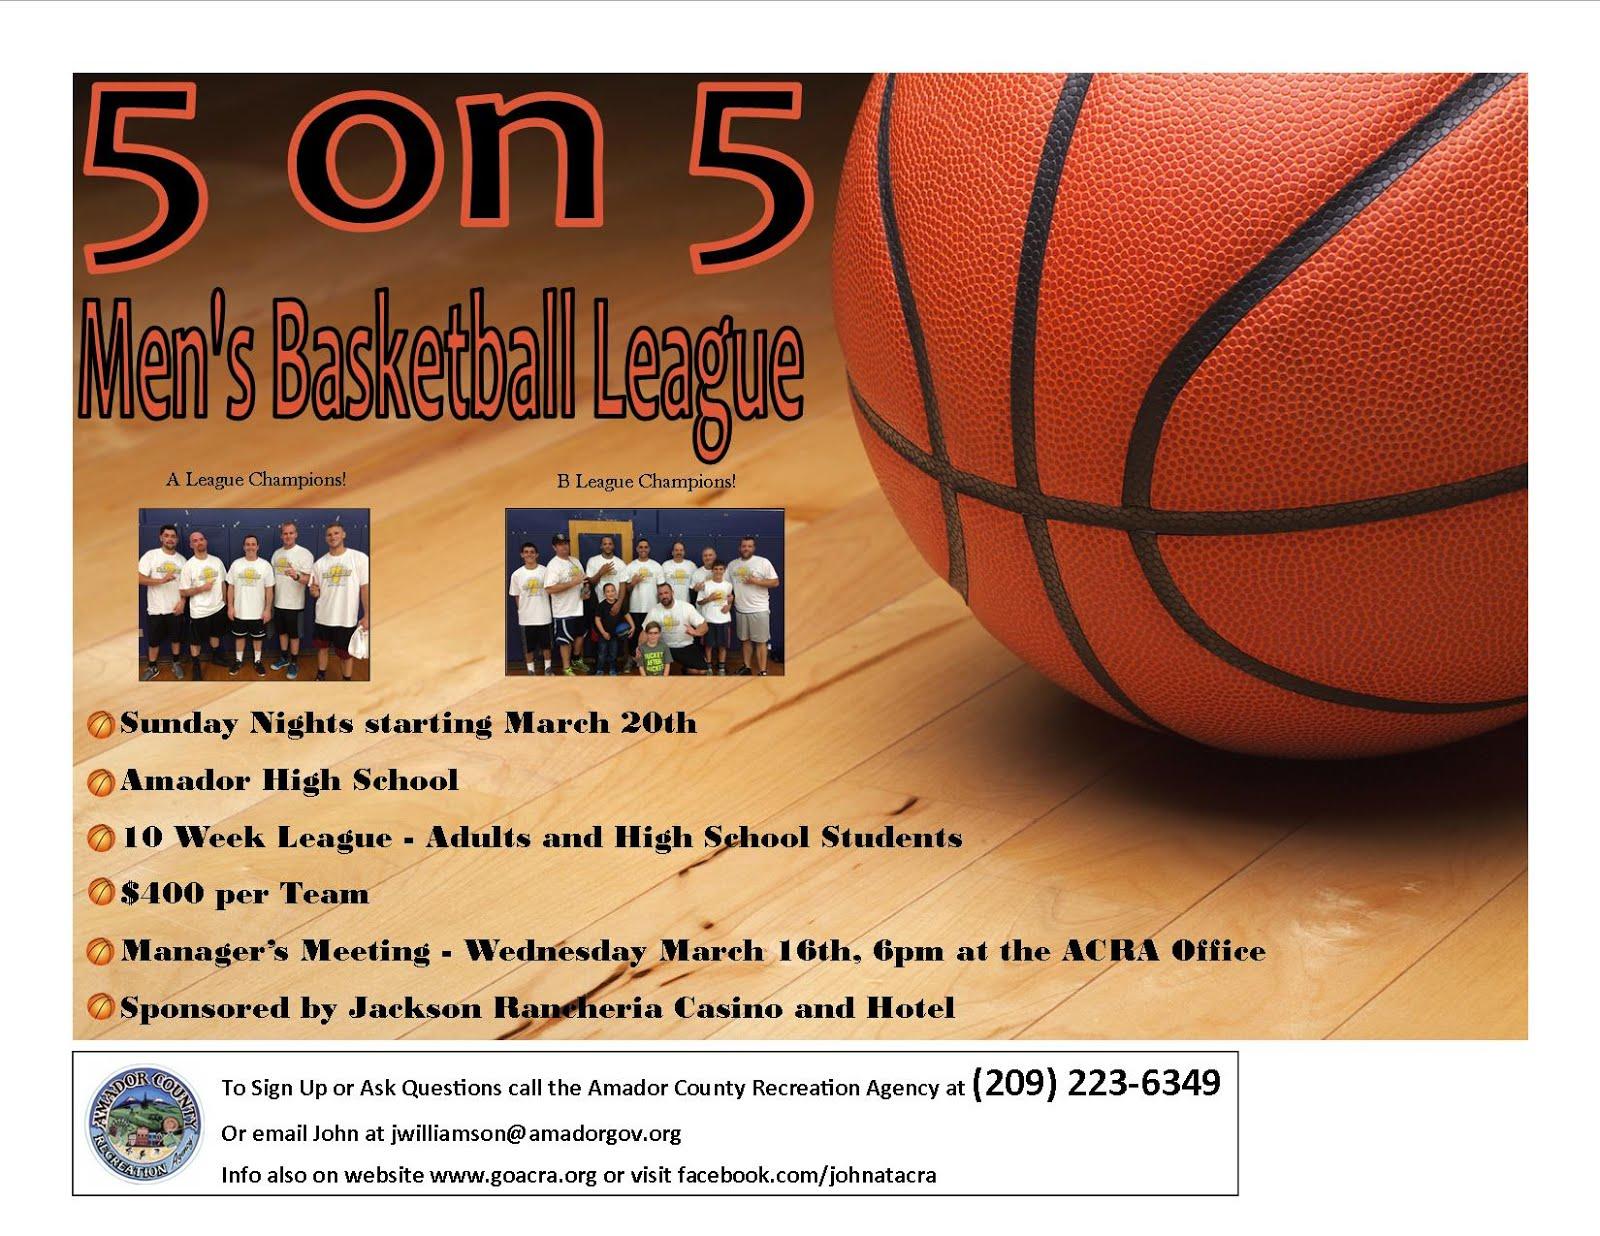 Men's Basketball - Begins Mar 20